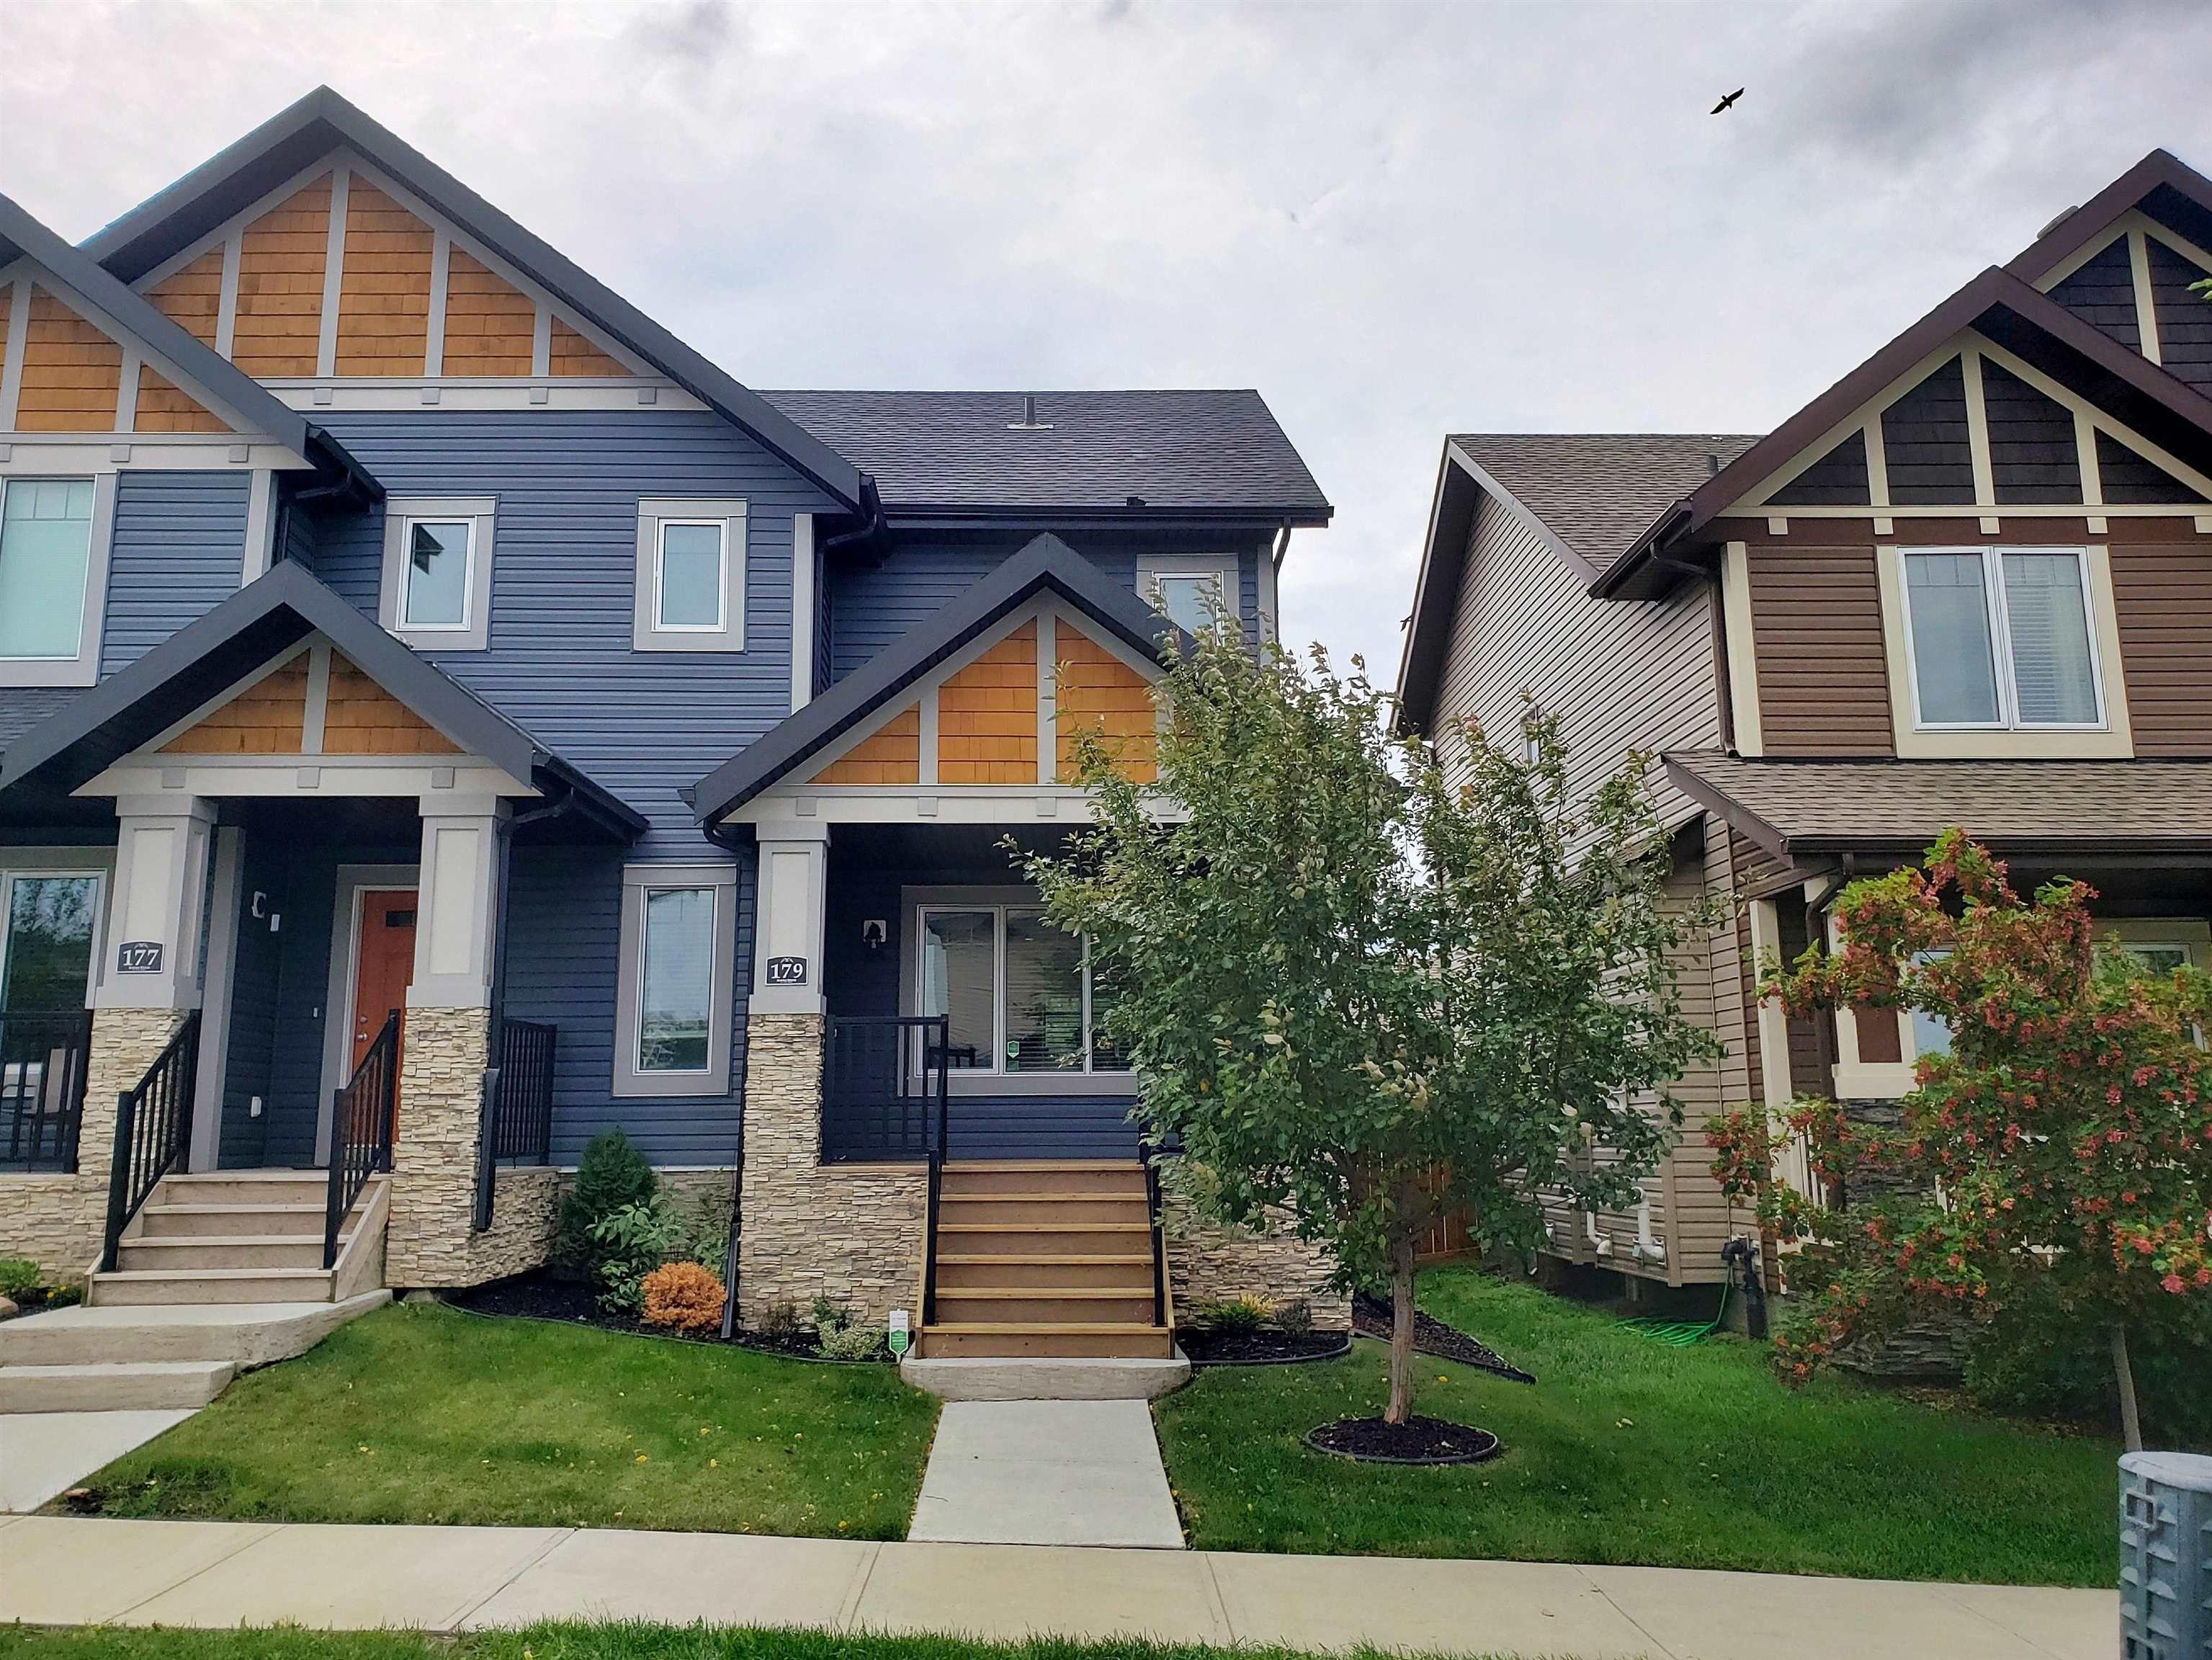 Main Photo: 179 HAWKS RIDGE Boulevard in Edmonton: Zone 59 House Half Duplex for sale : MLS®# E4261420